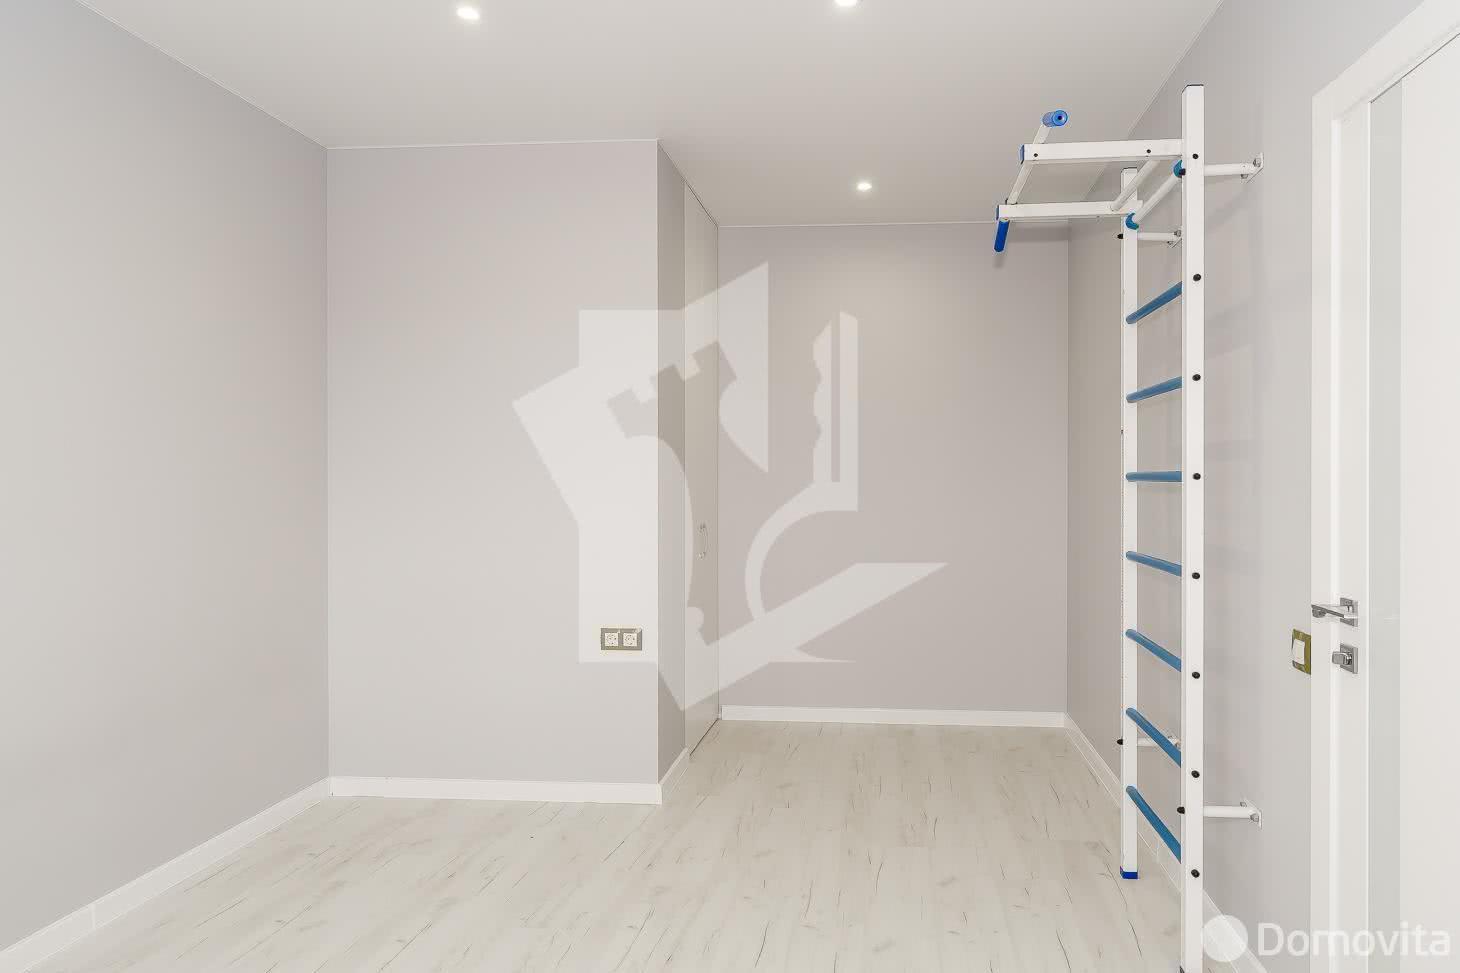 Снять 3-комнатную квартиру в Минске, ул. Мястровская, д. 28 - фото 3